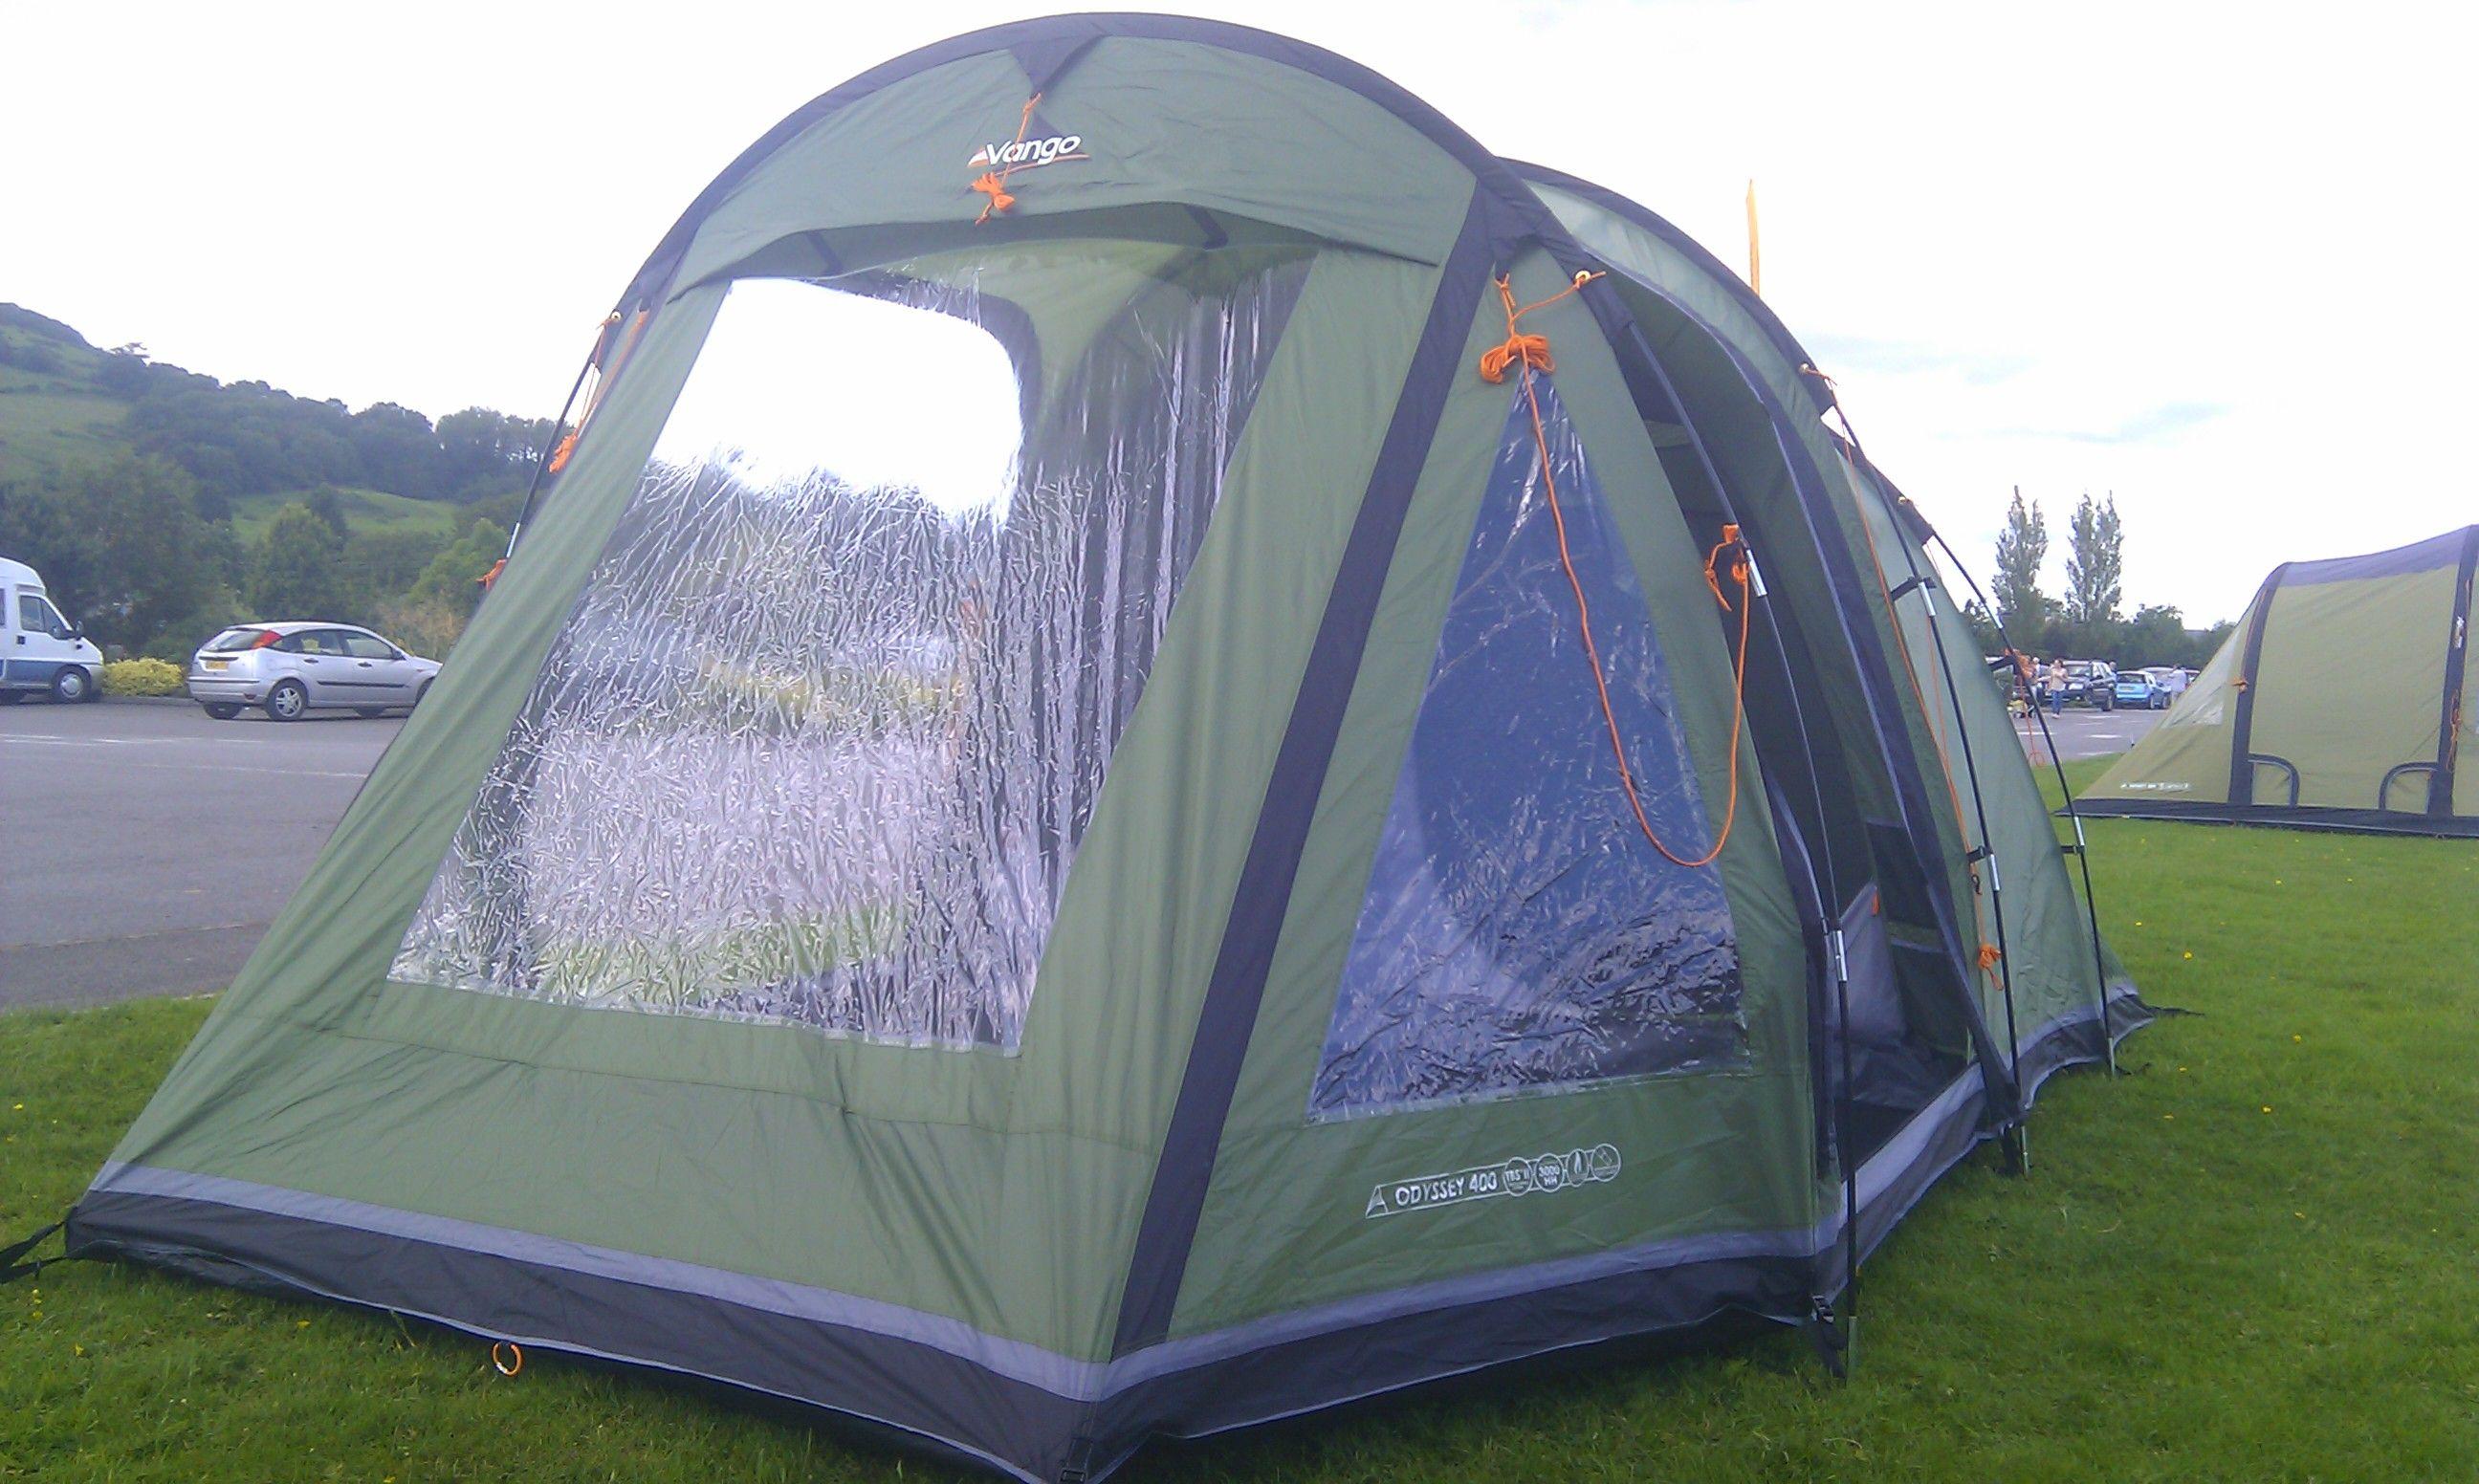 Vango Odyssey 400 #c&ing #tent  sc 1 st  Pinterest & Vango Odyssey 400 #camping #tent | France Holiday 2014 | Pinterest ...